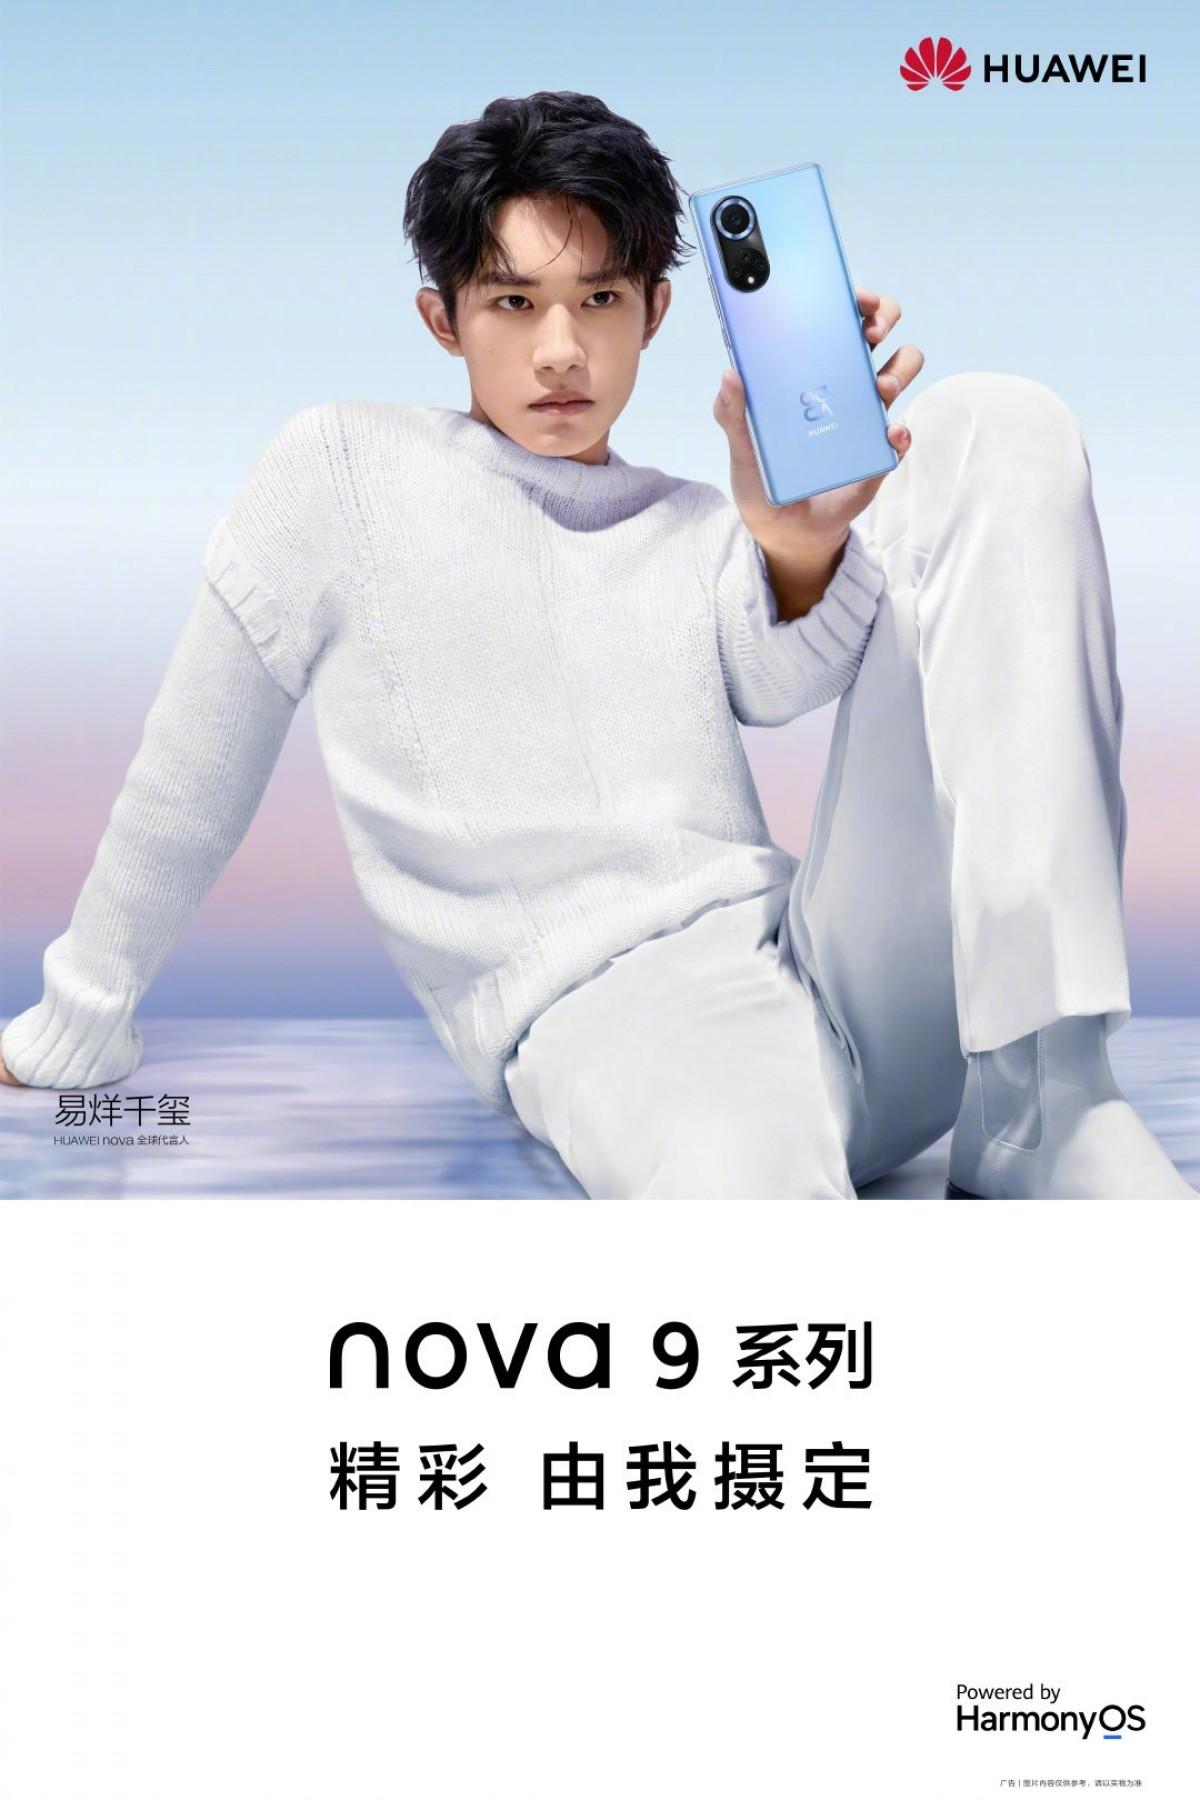 Huawei Nova 9: Επίσημη παρουσίαση στις 23 Σεπτεμβρίου